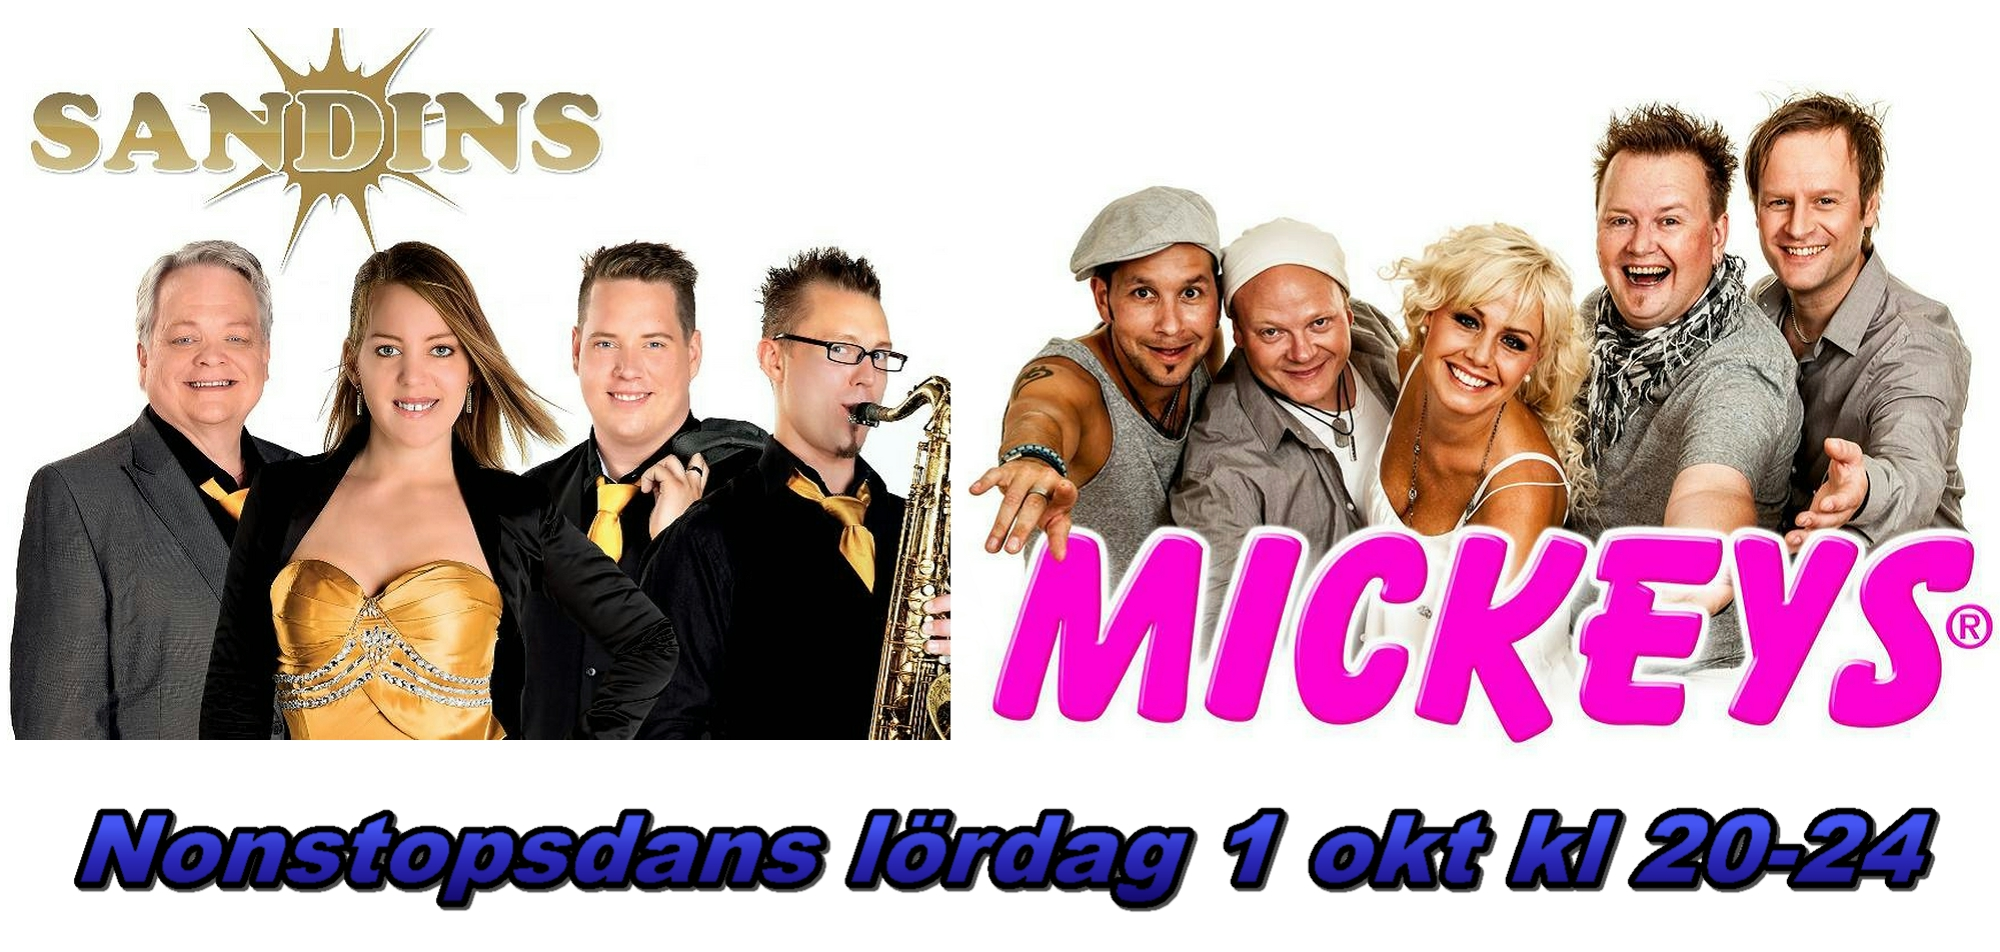 Mickeys/ Sandins